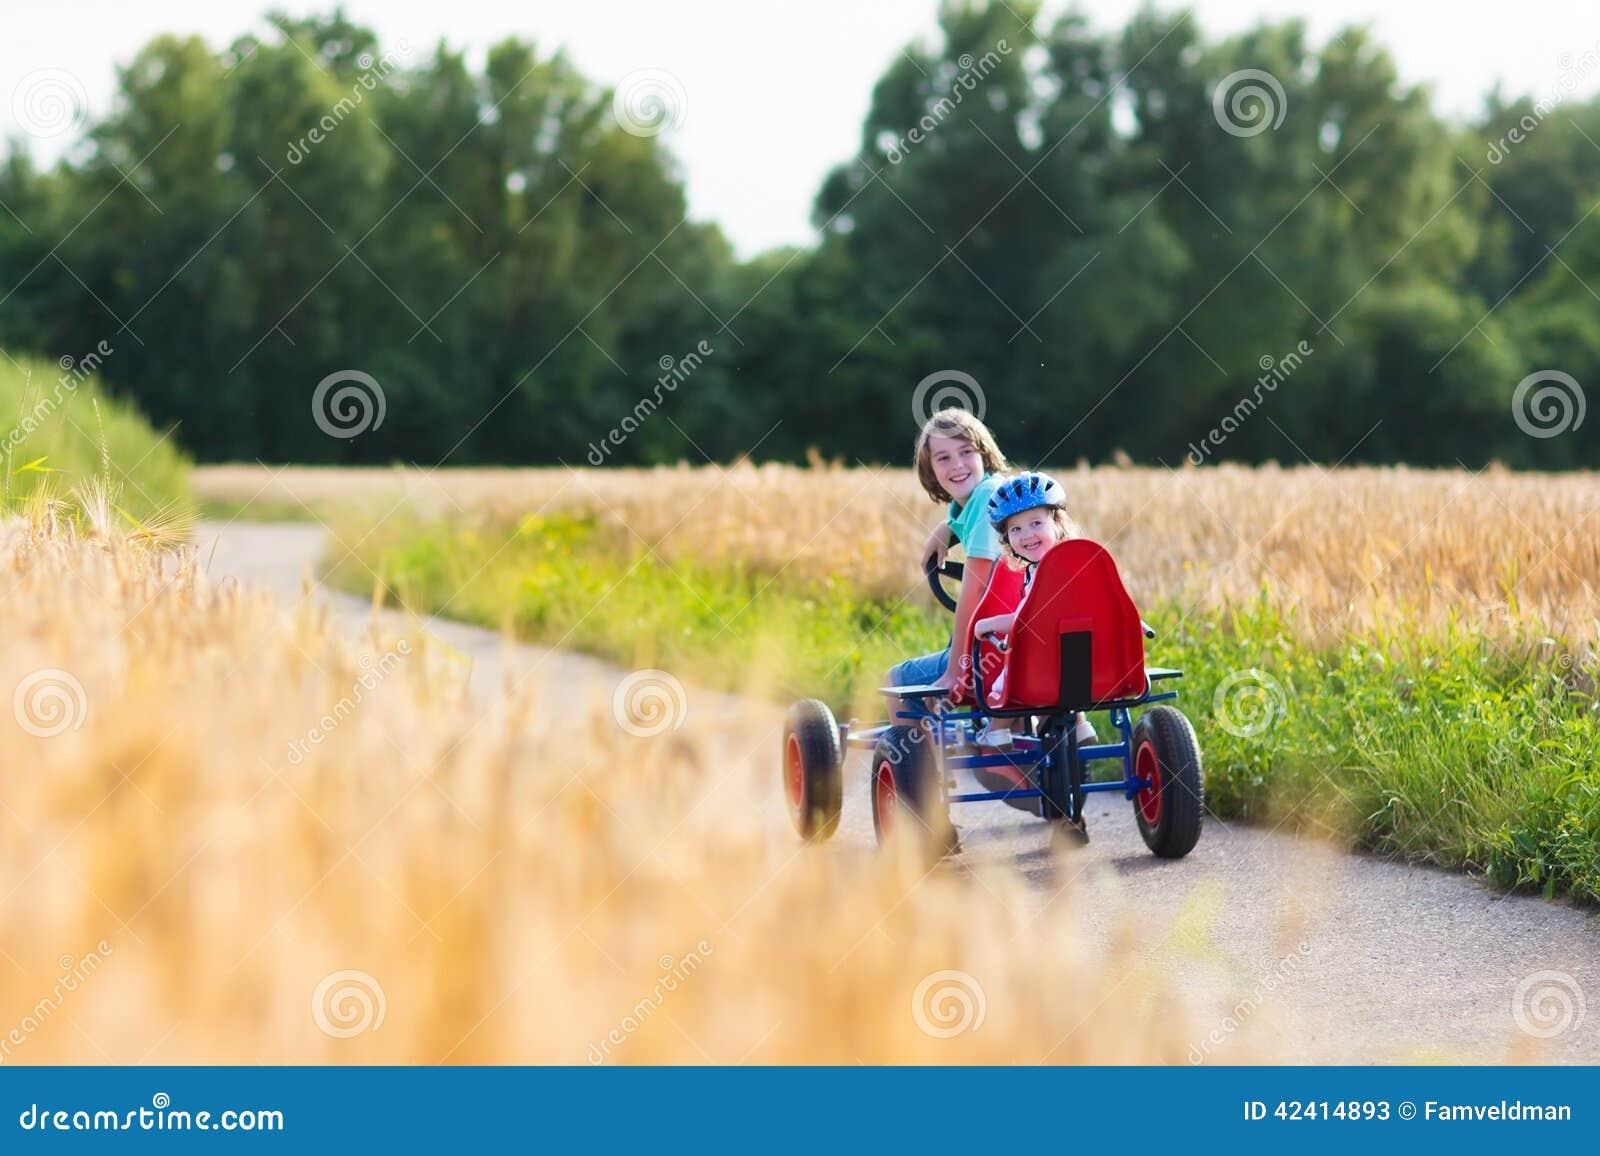 Kids having fun with a go cart car